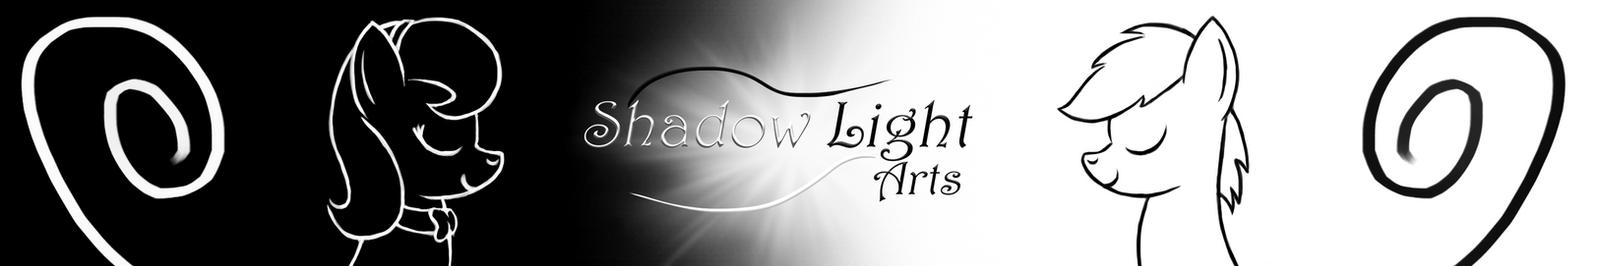 Shadow Light Arts Banner by EGStudios93